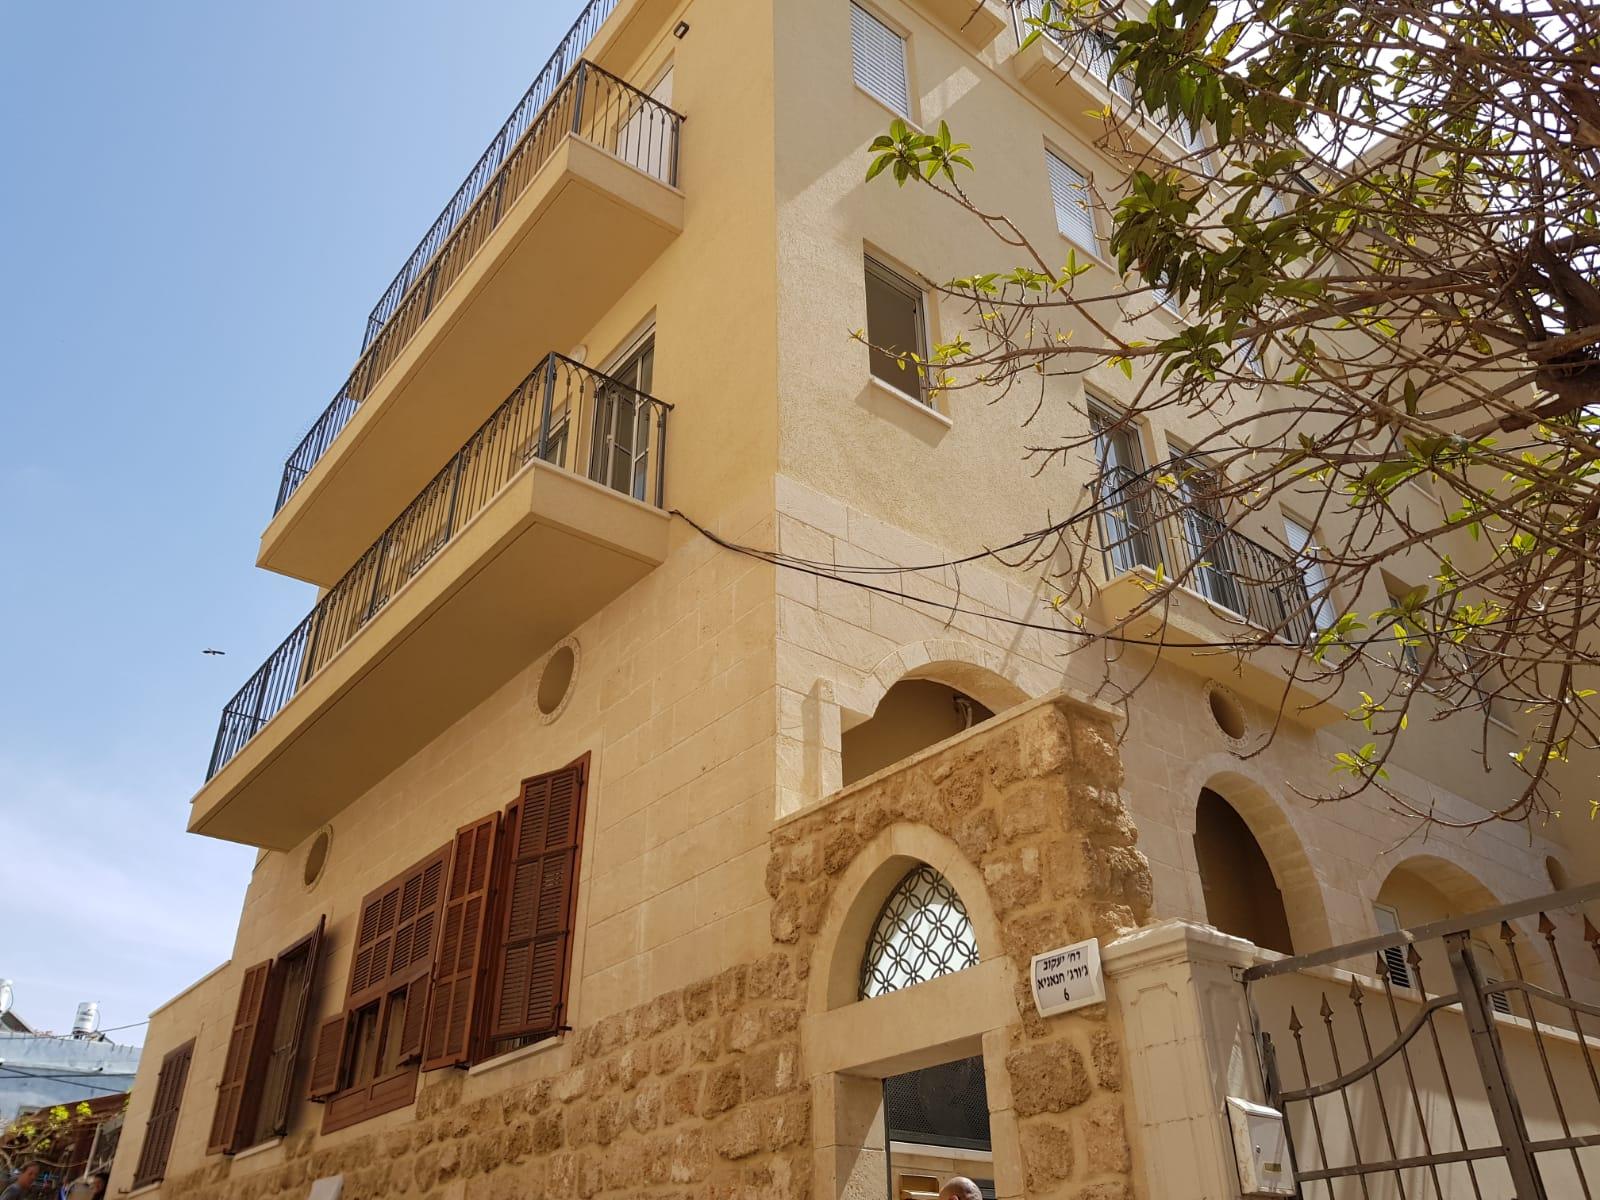 3 bedroom apartment in Jaffa